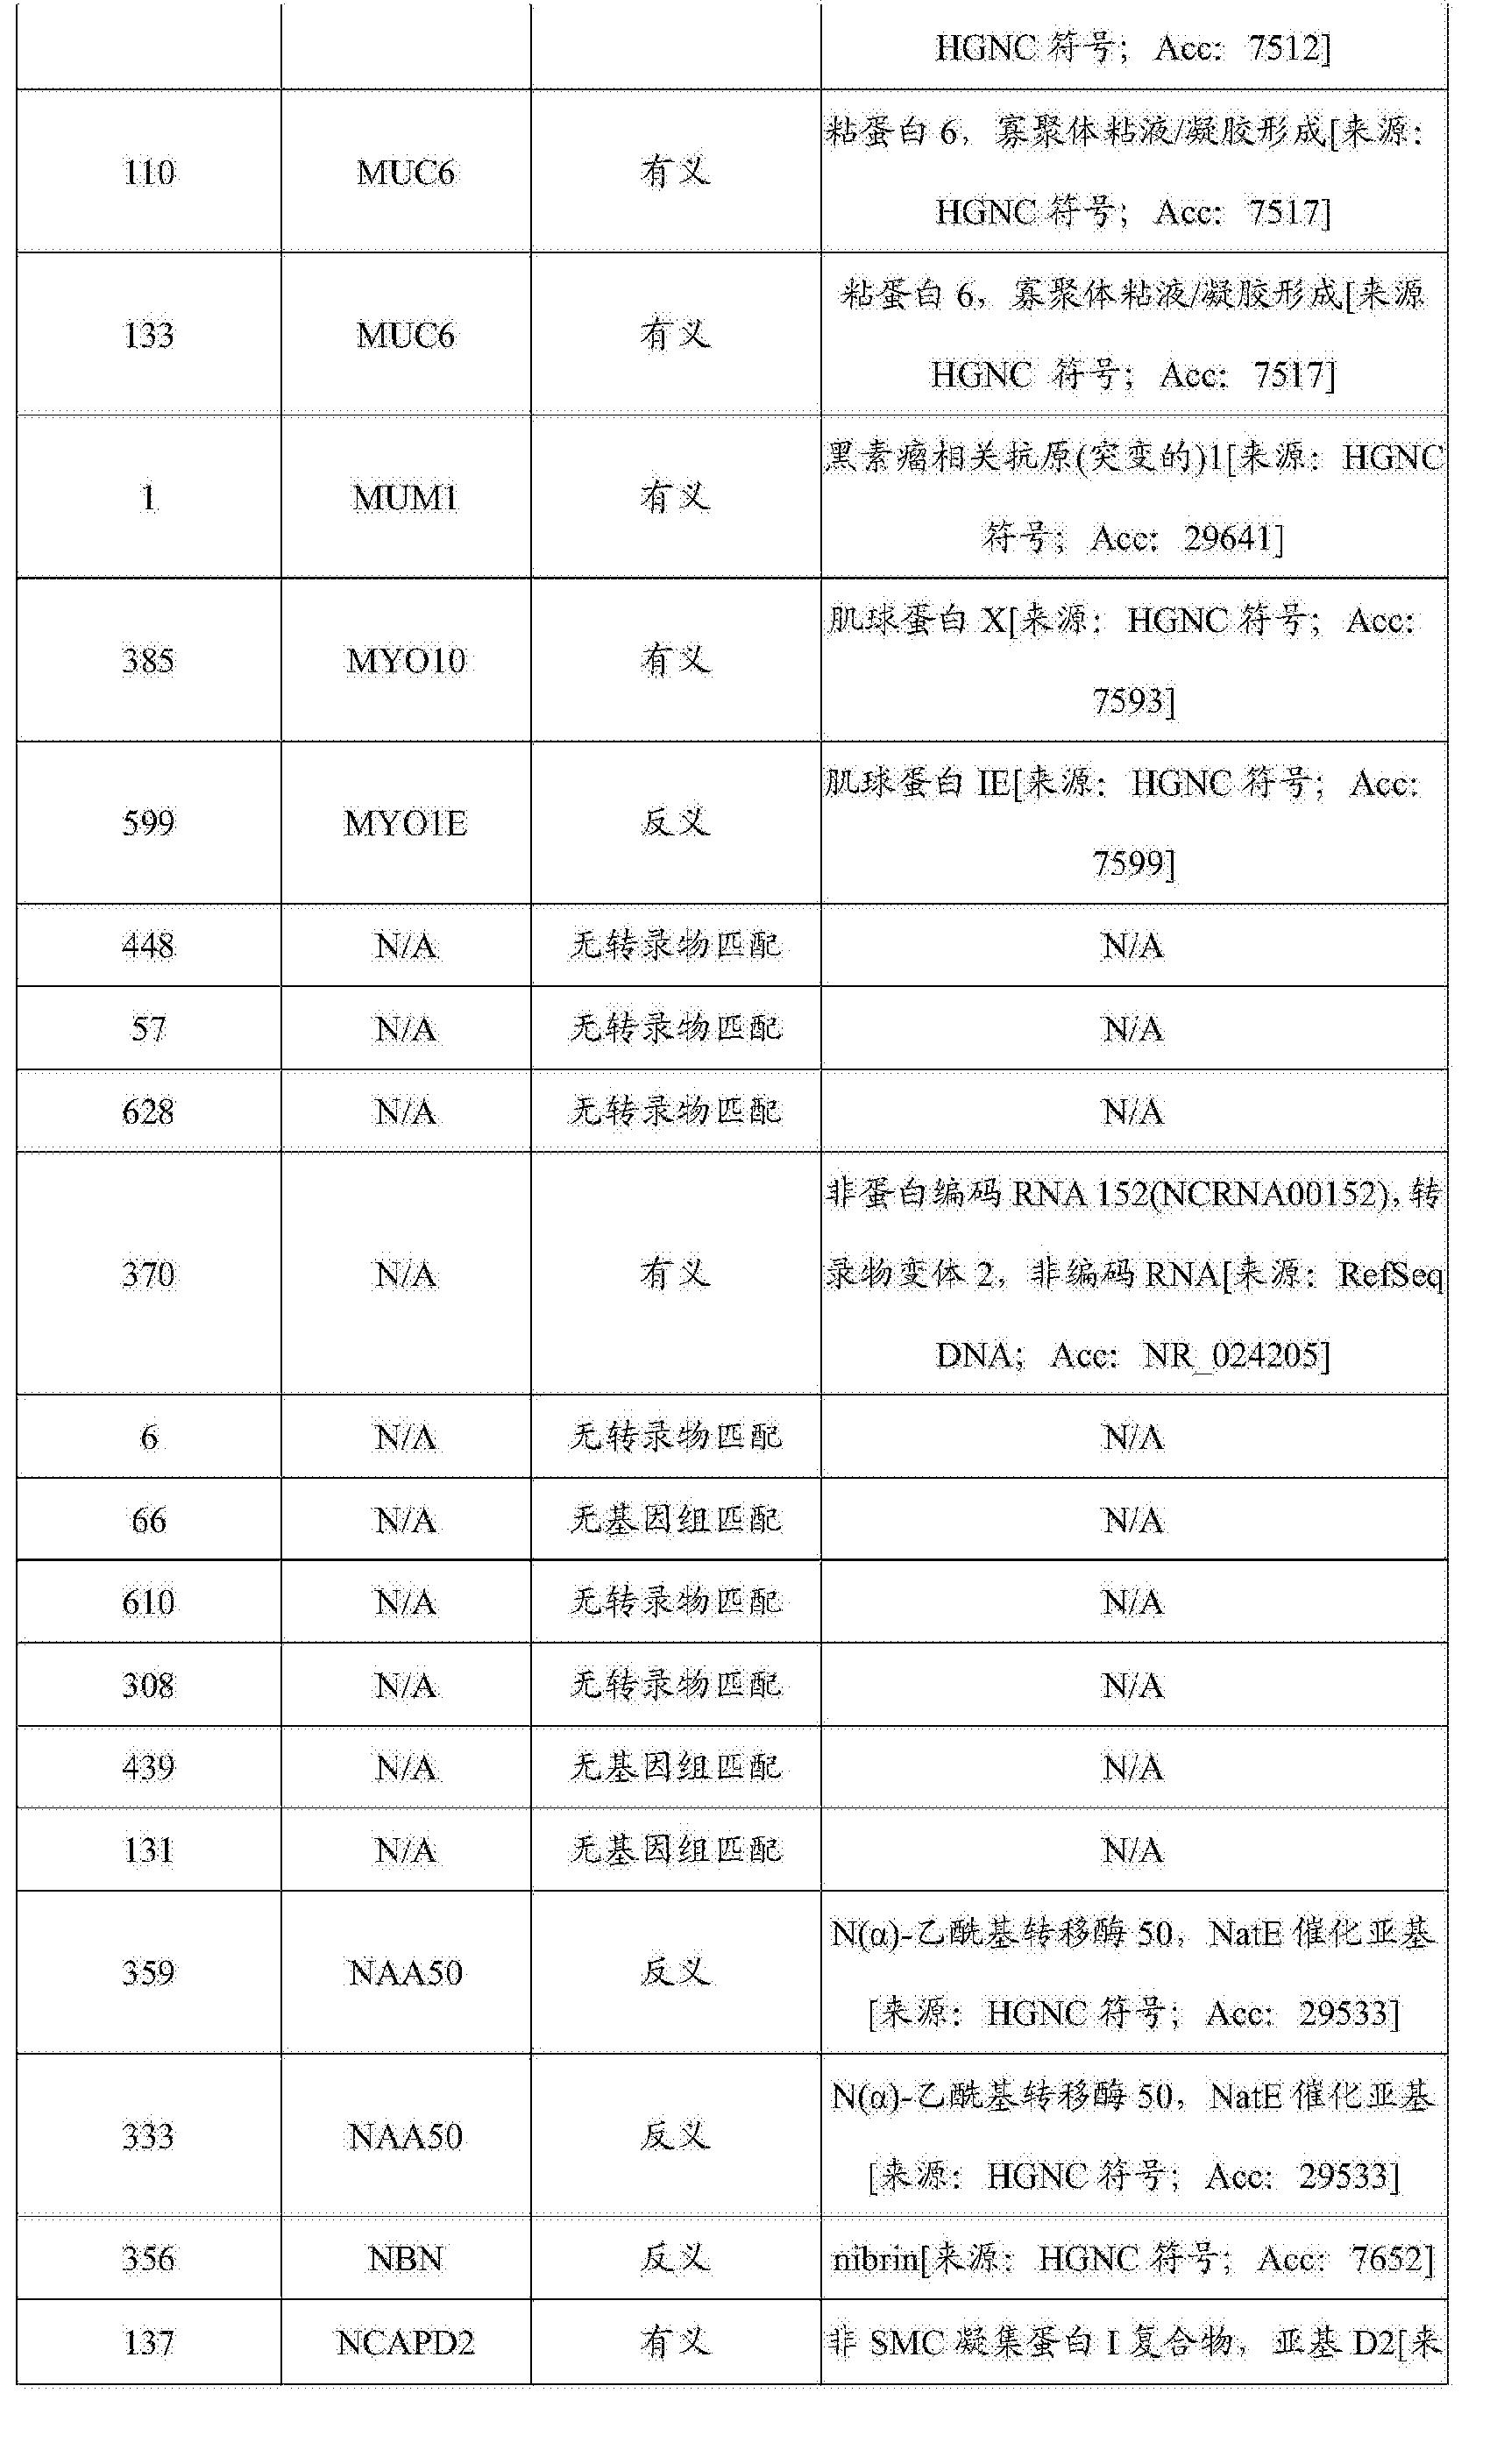 Figure CN103403543B9D00311